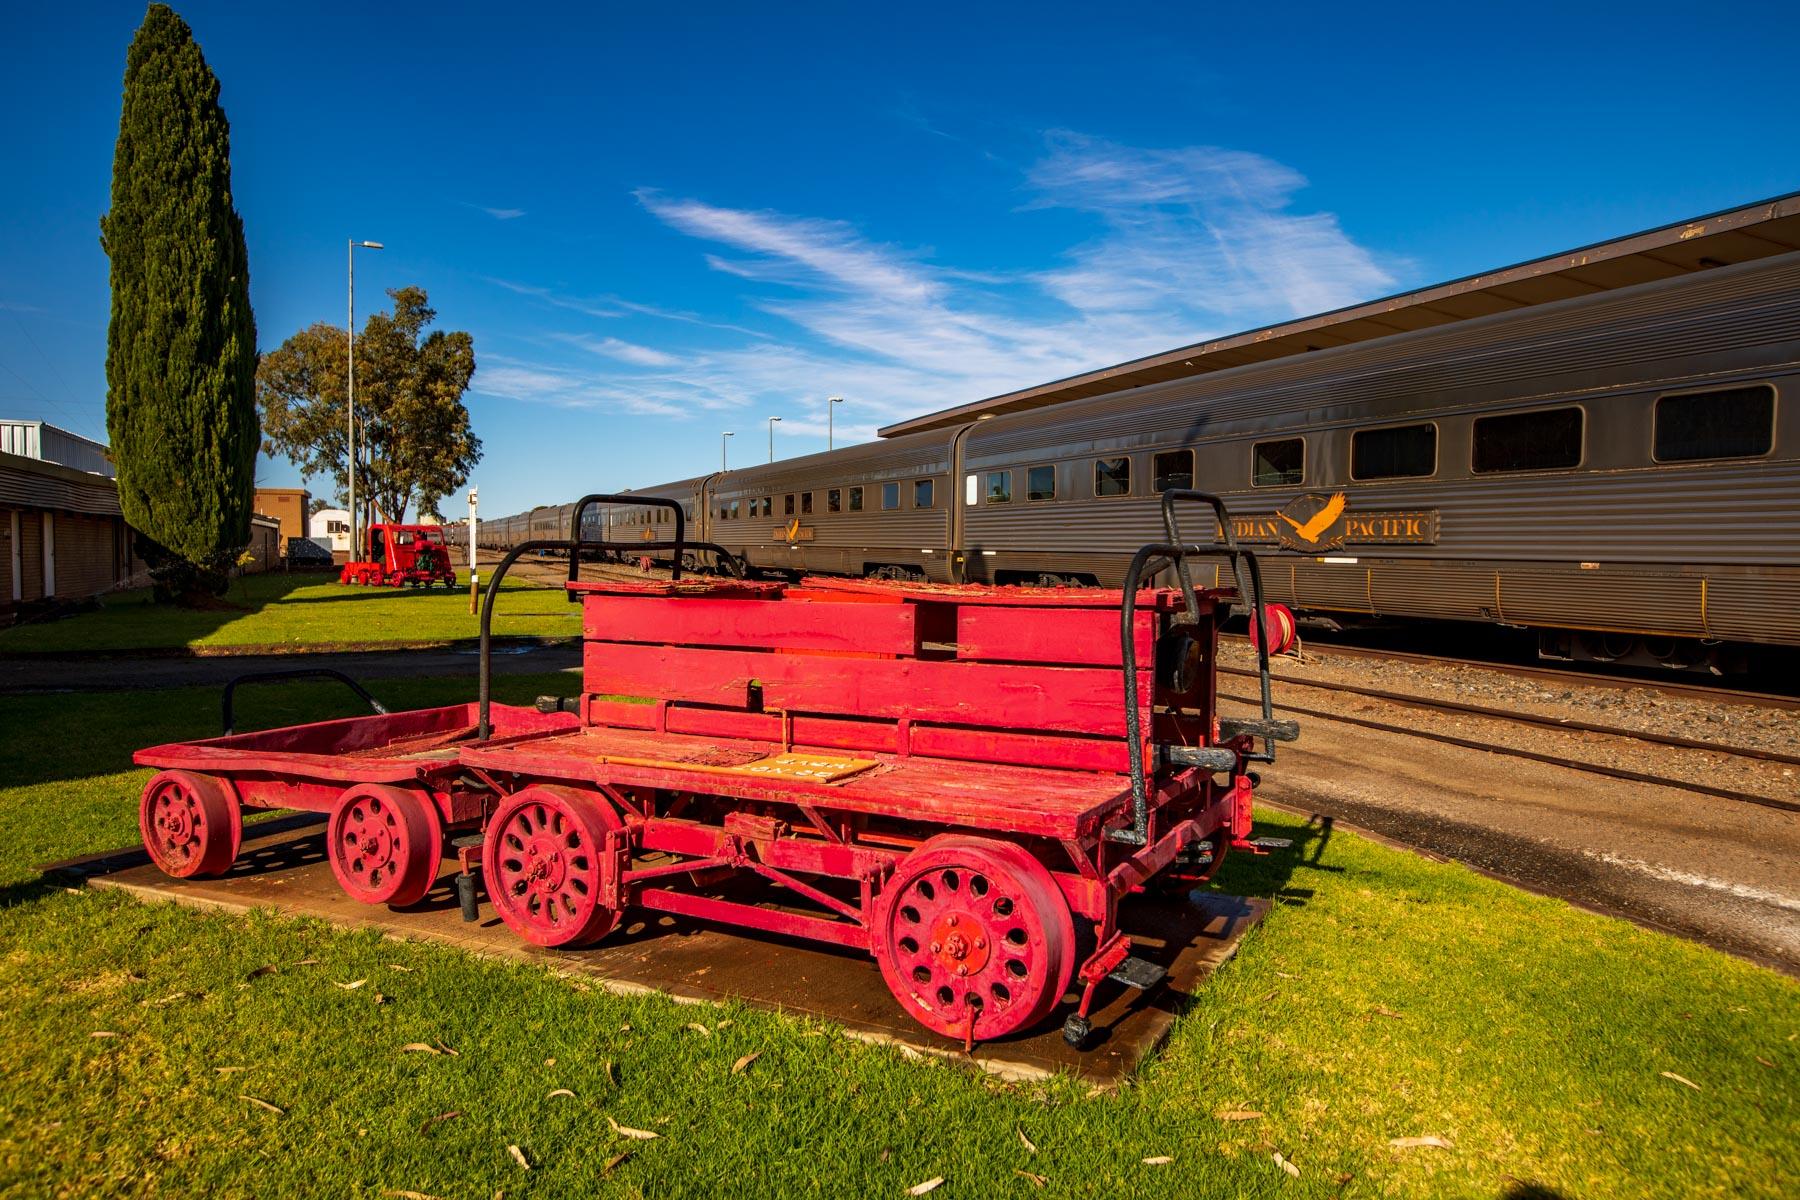 Vintage moterised hand car Broken Hill NSW, Australia